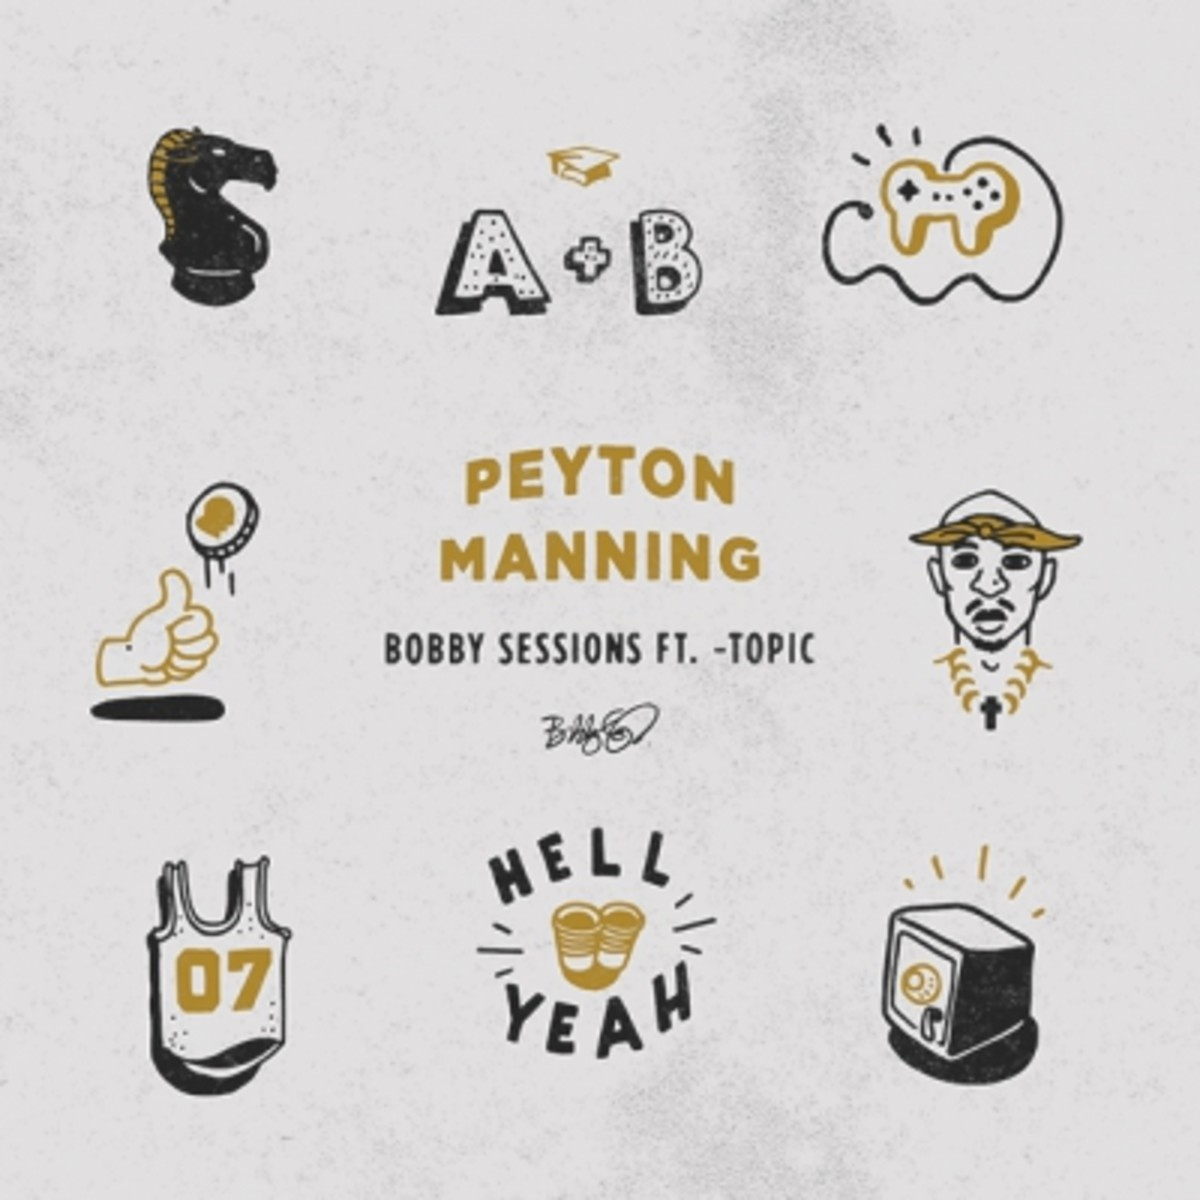 bobby-sessions-peyton-manning.jpg